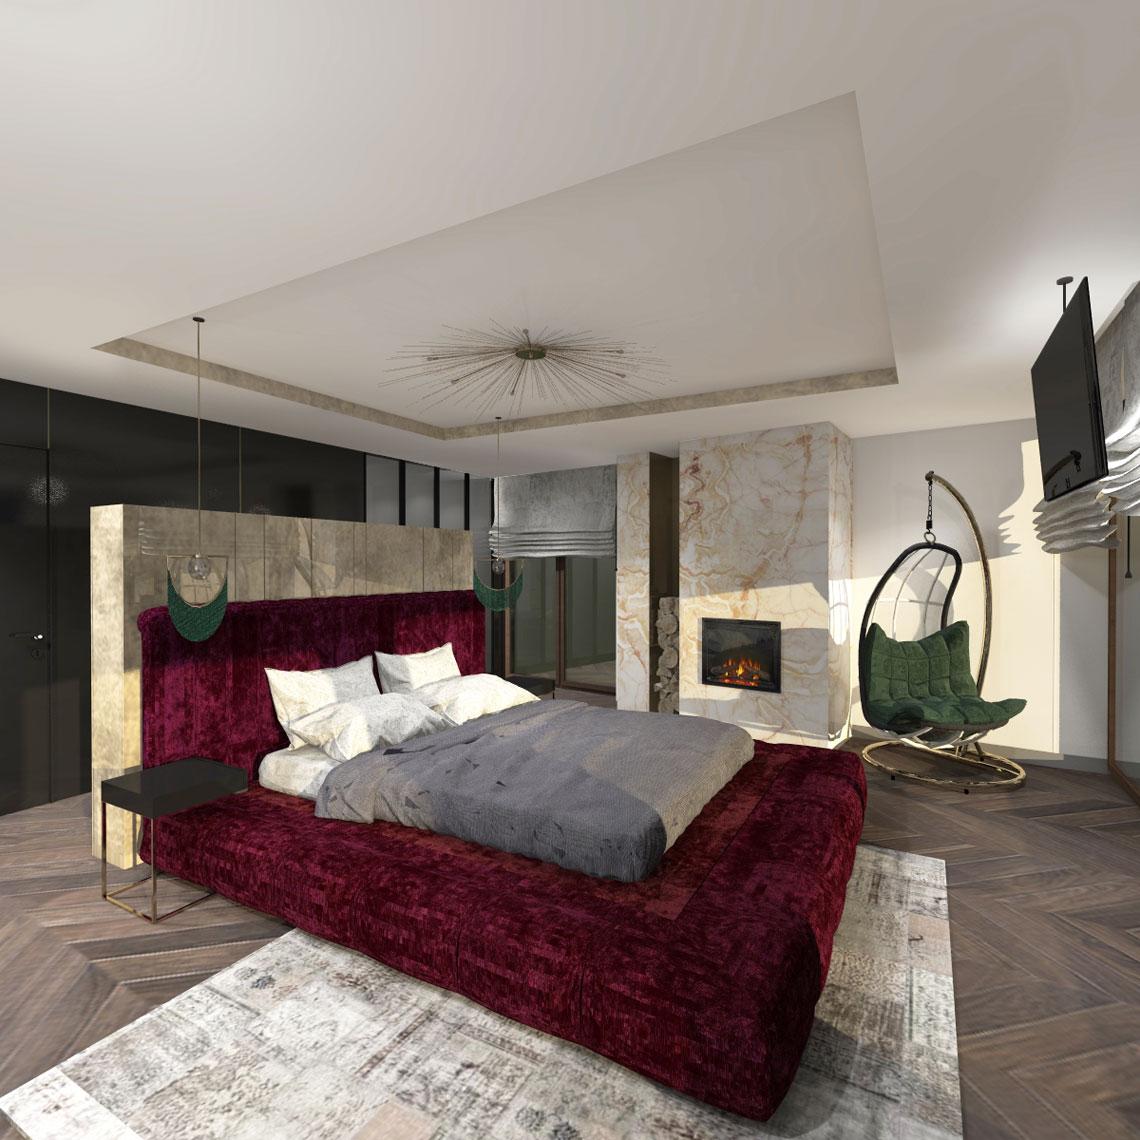 Miegamojo-kambarys-1.jpg